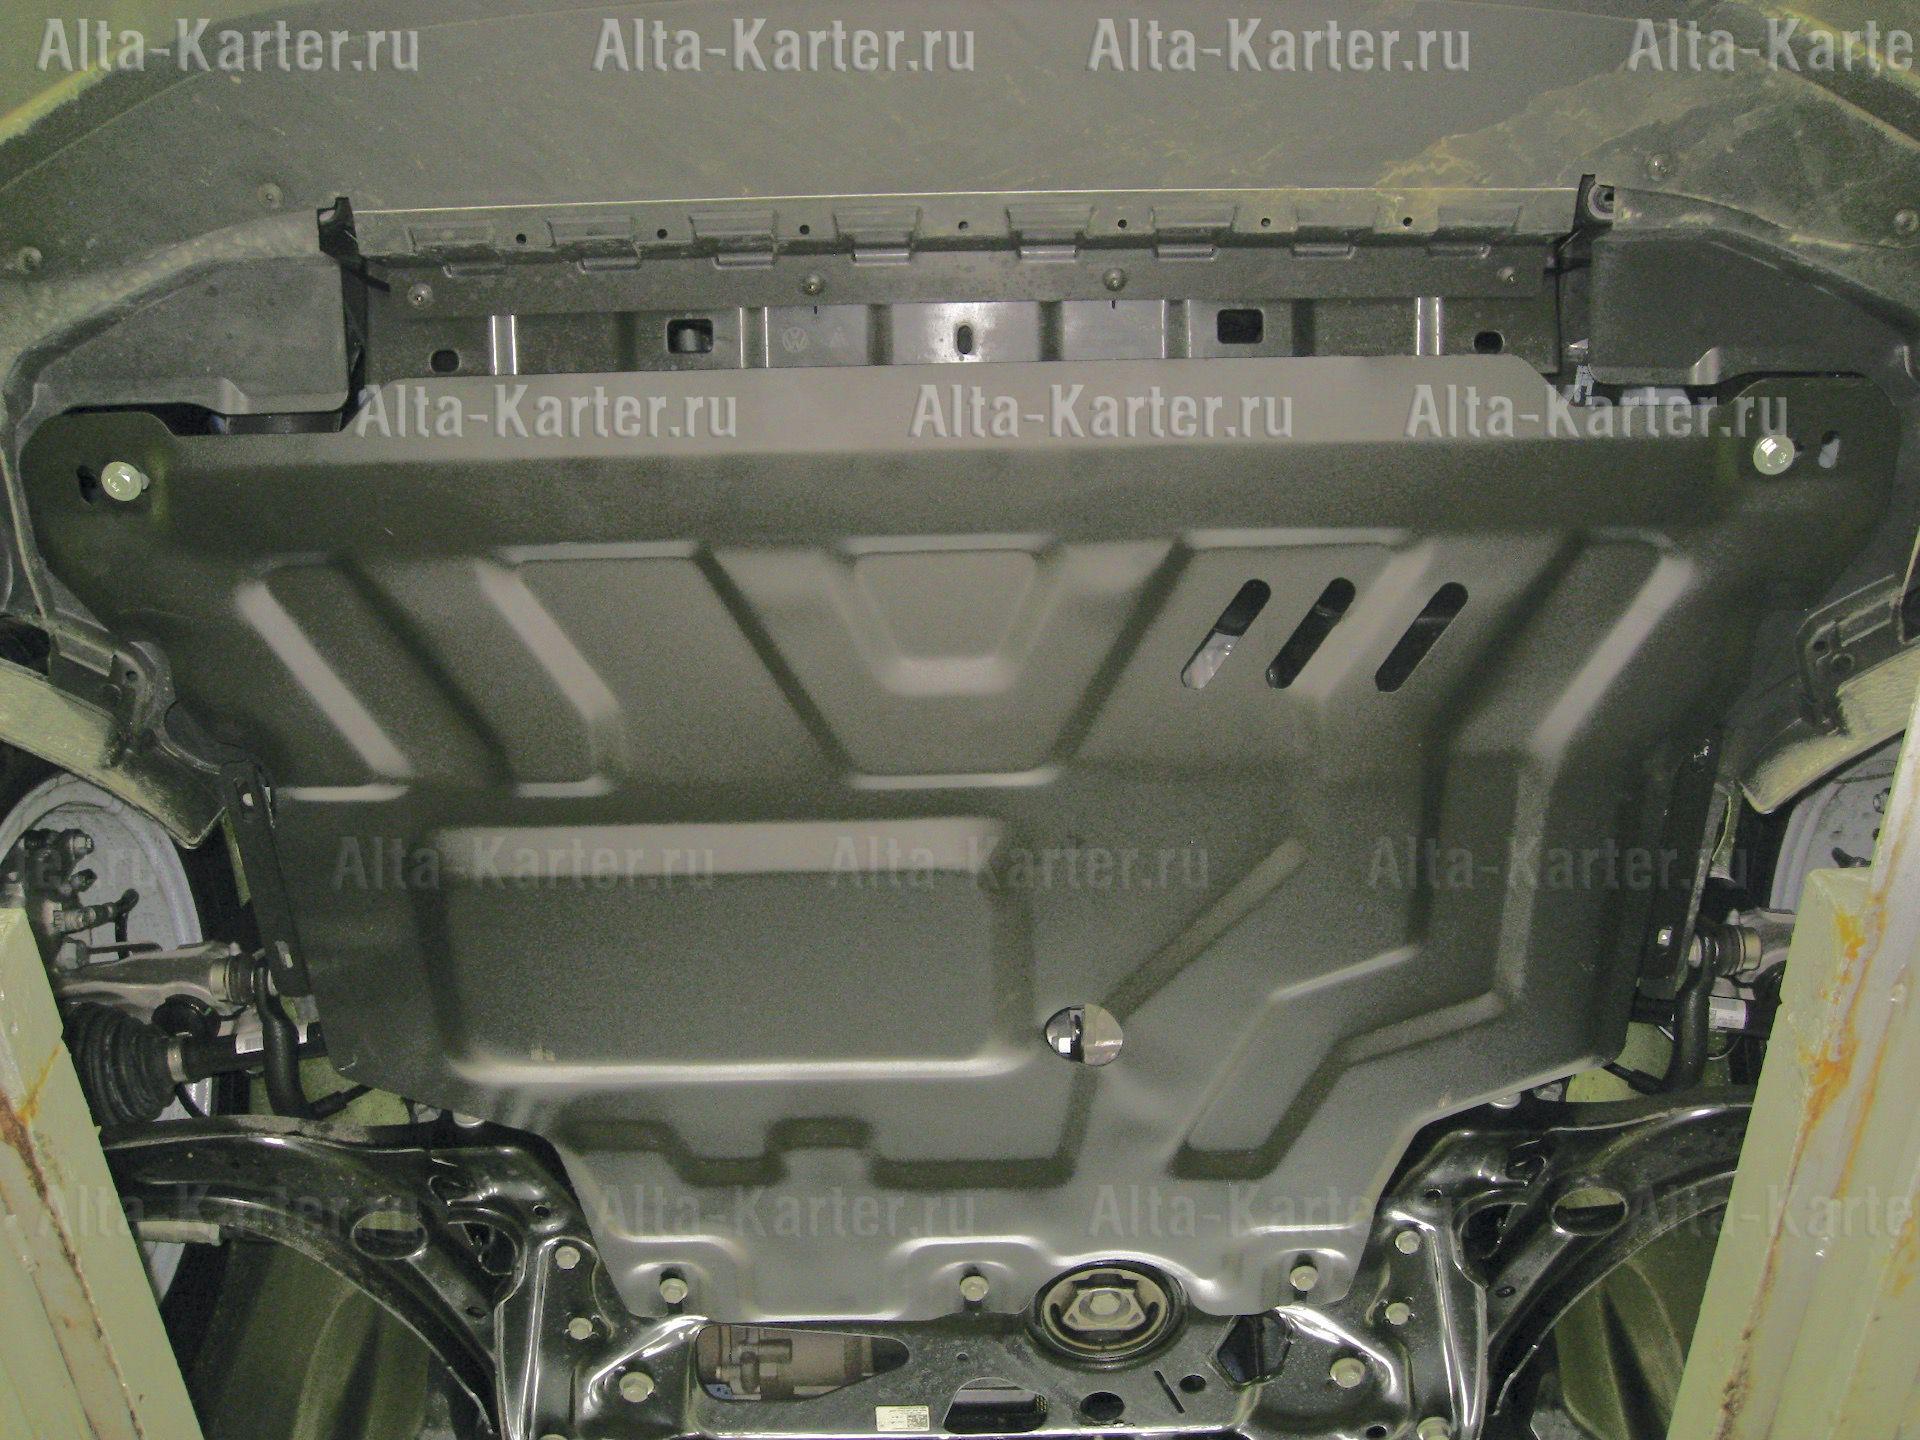 Защита Alfeco для картера и КПП Volkswagen Tiguan II 2017-2021. Артикул ALF.26.44st